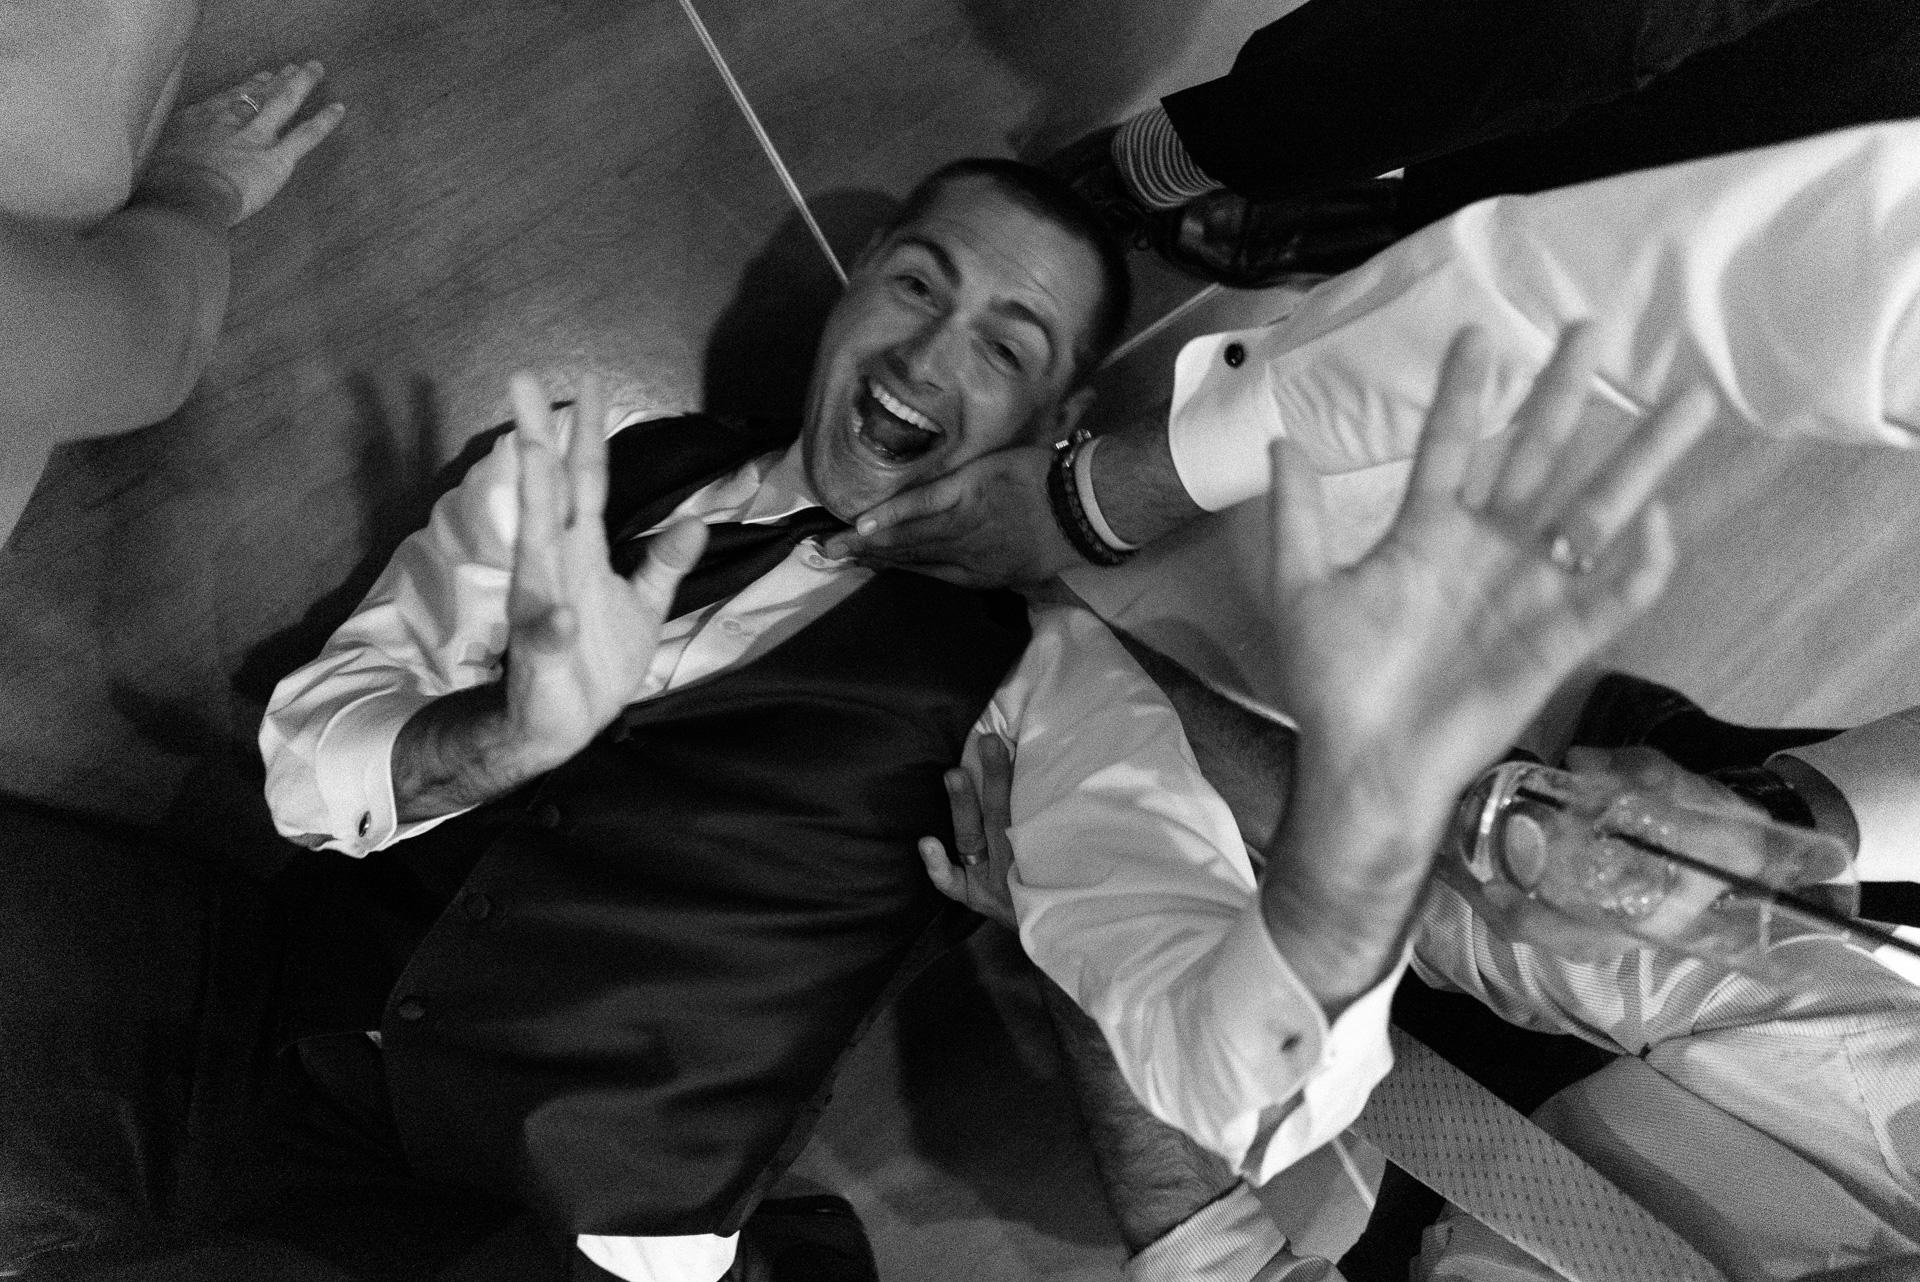 Dayton Wedding Photographer - Groomsmen Dancing